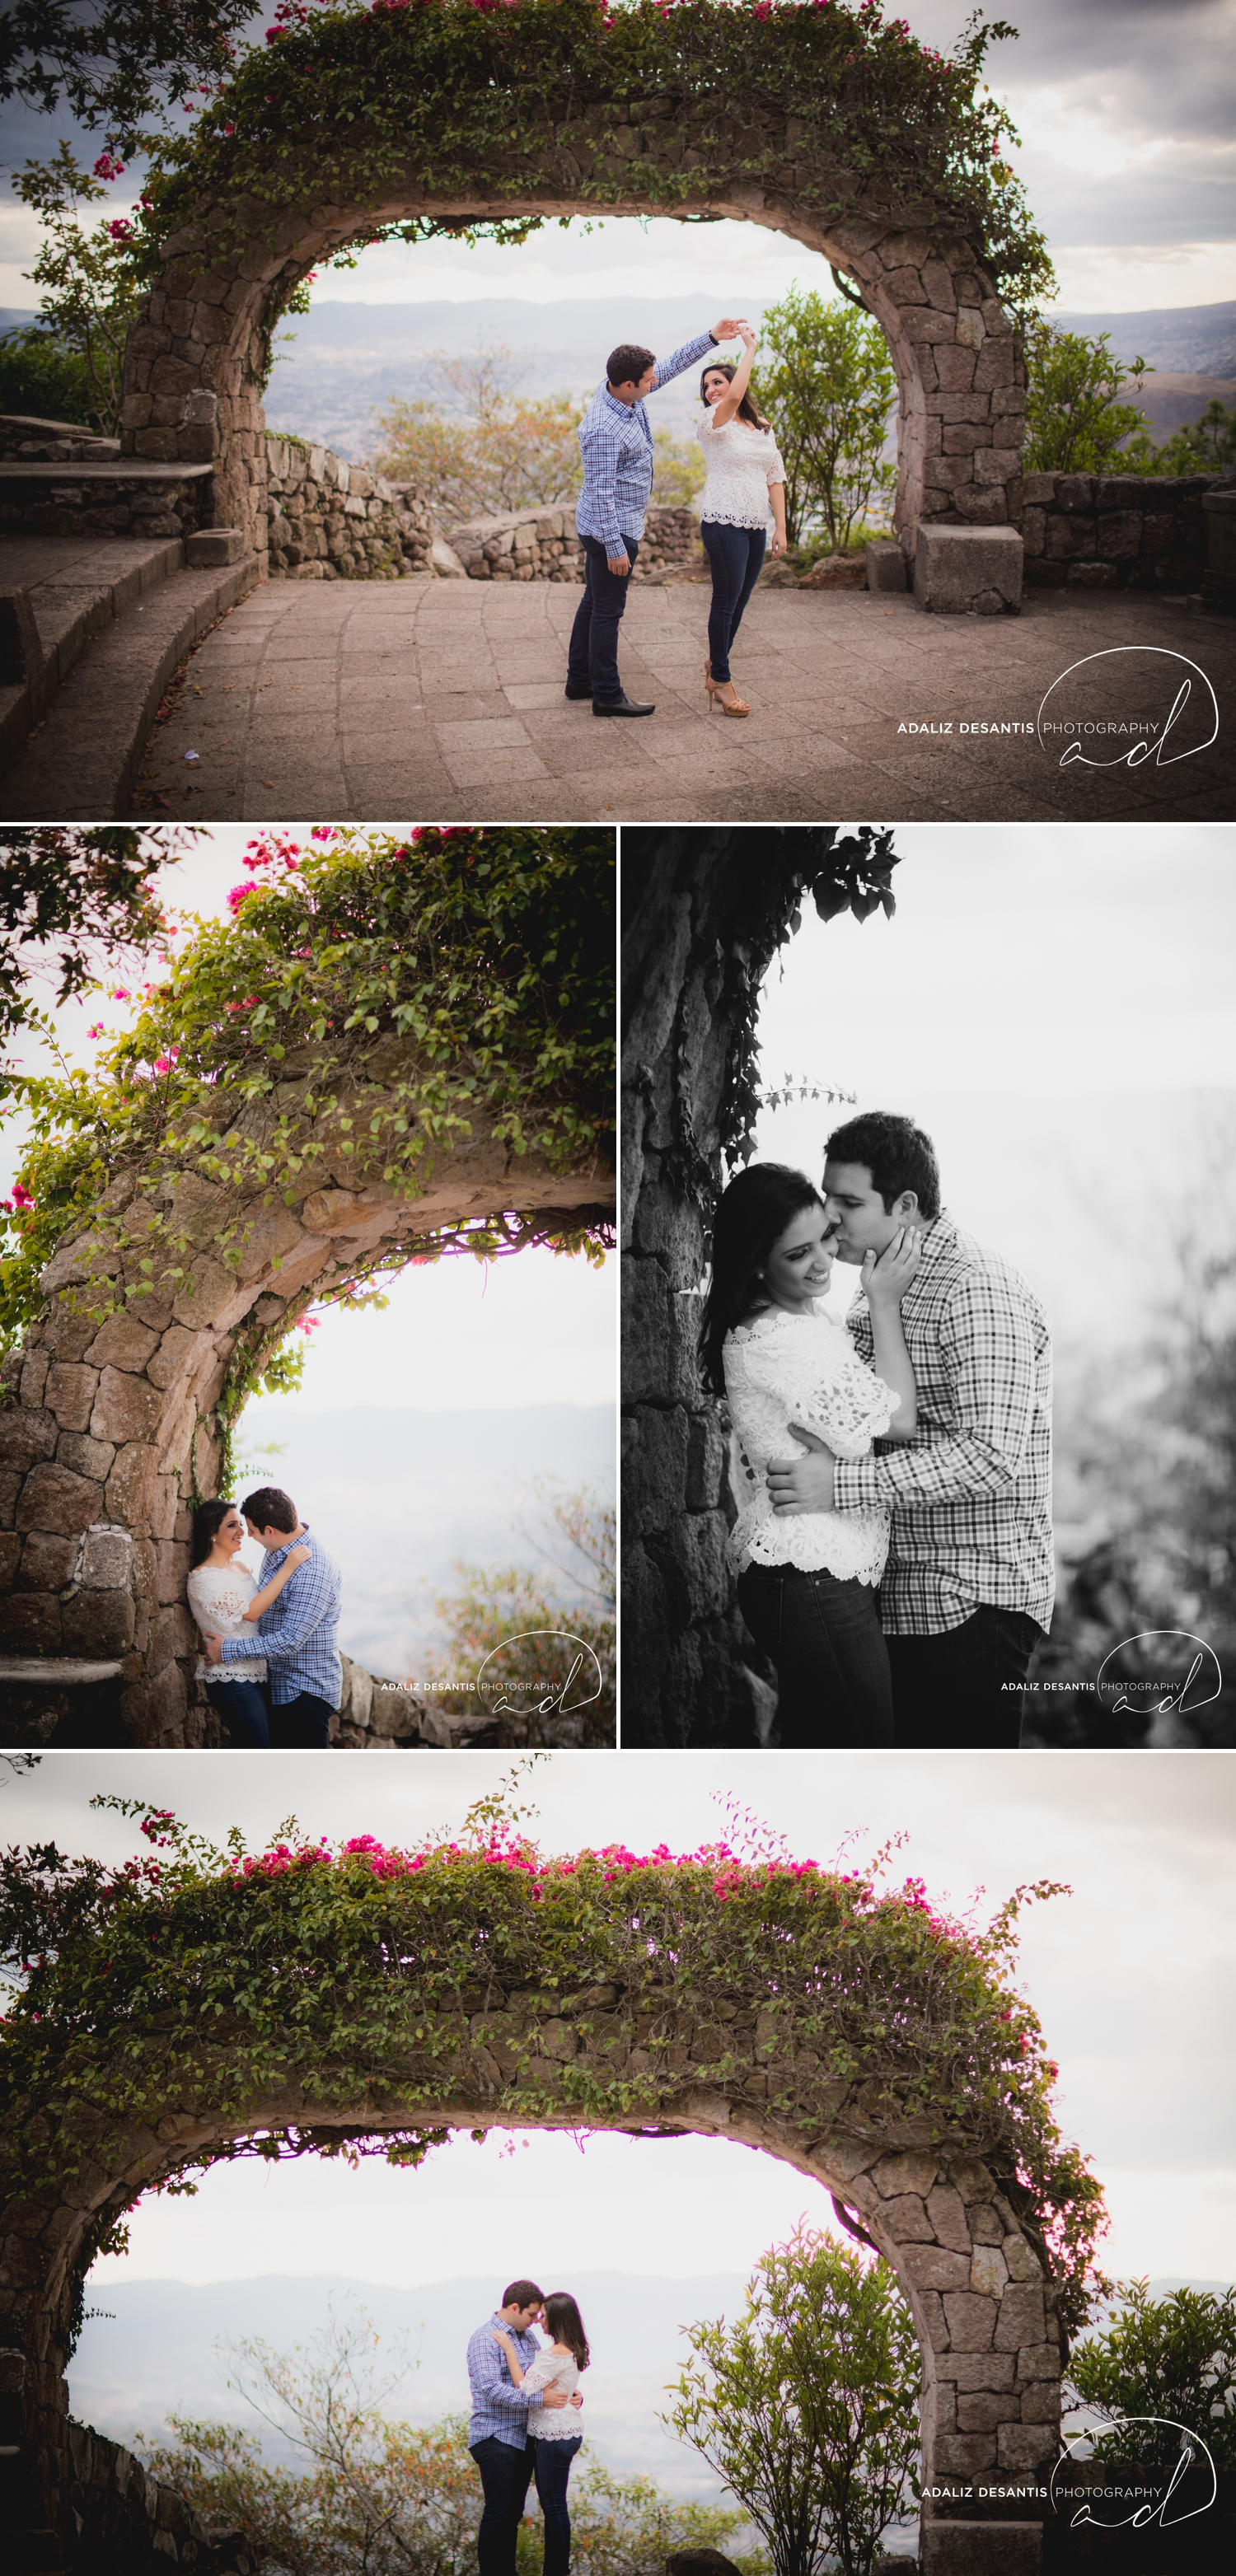 Lorette y Roger Engaged 2